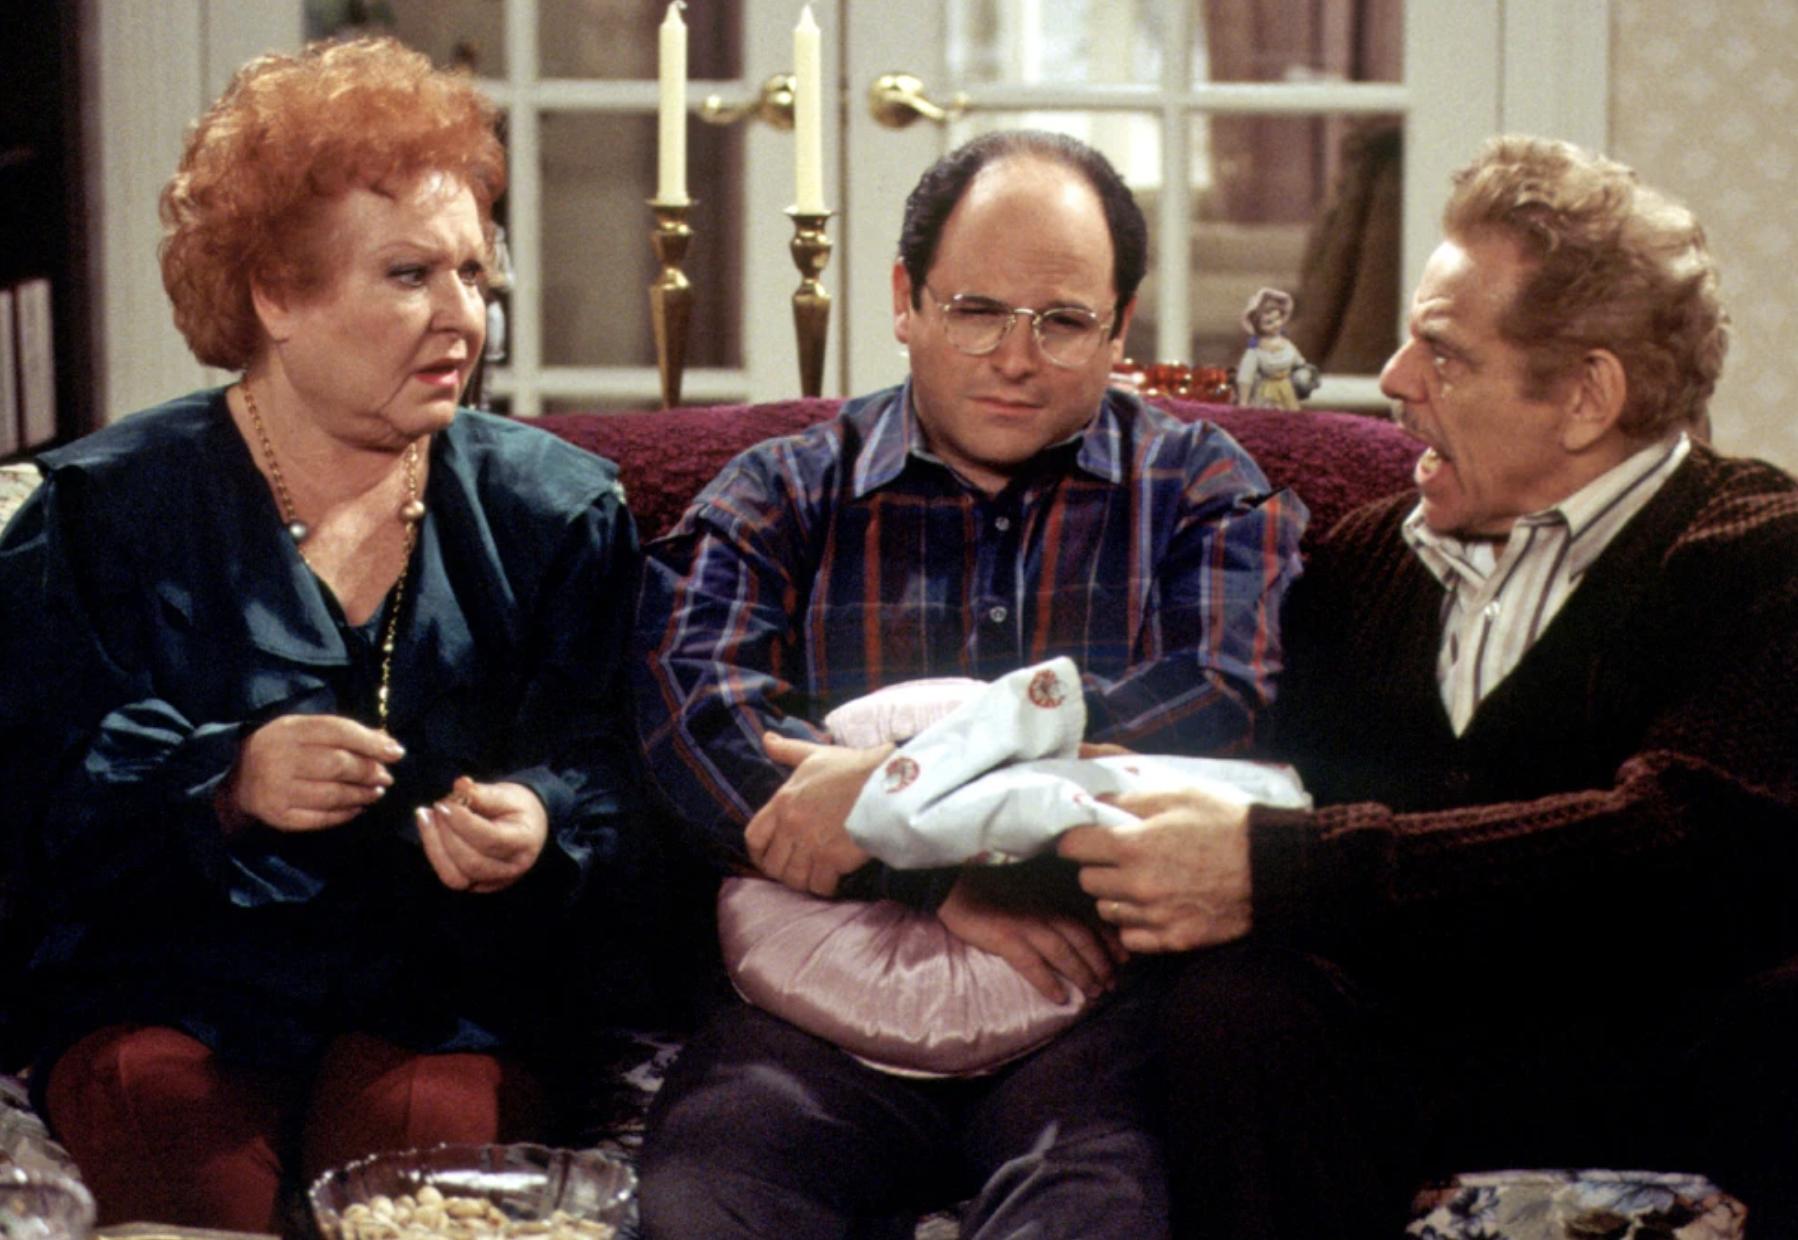 Scene from Seinfeld 'The Strike', about Festivus